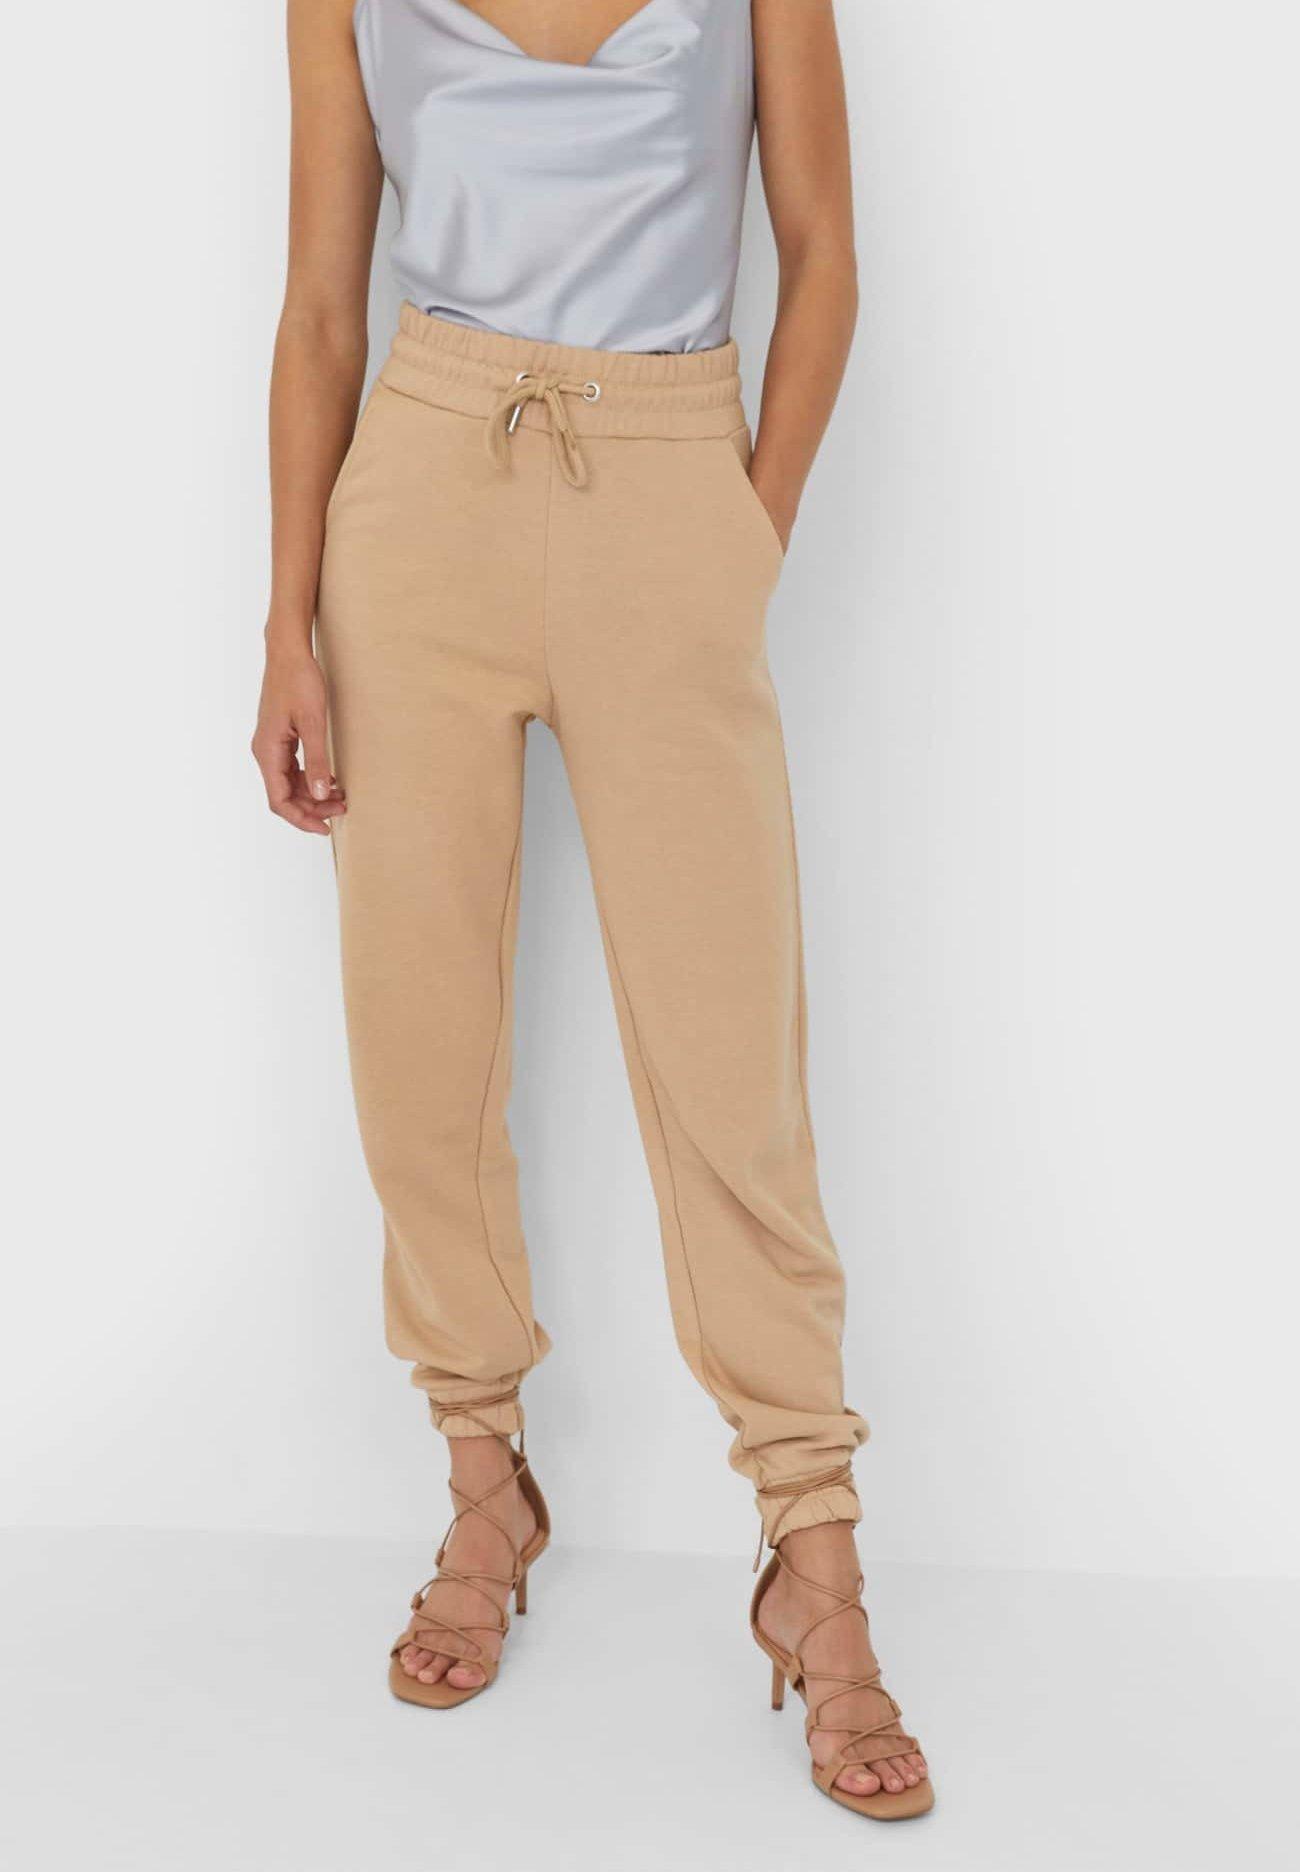 pantalon satin brillant femme fluide zalando